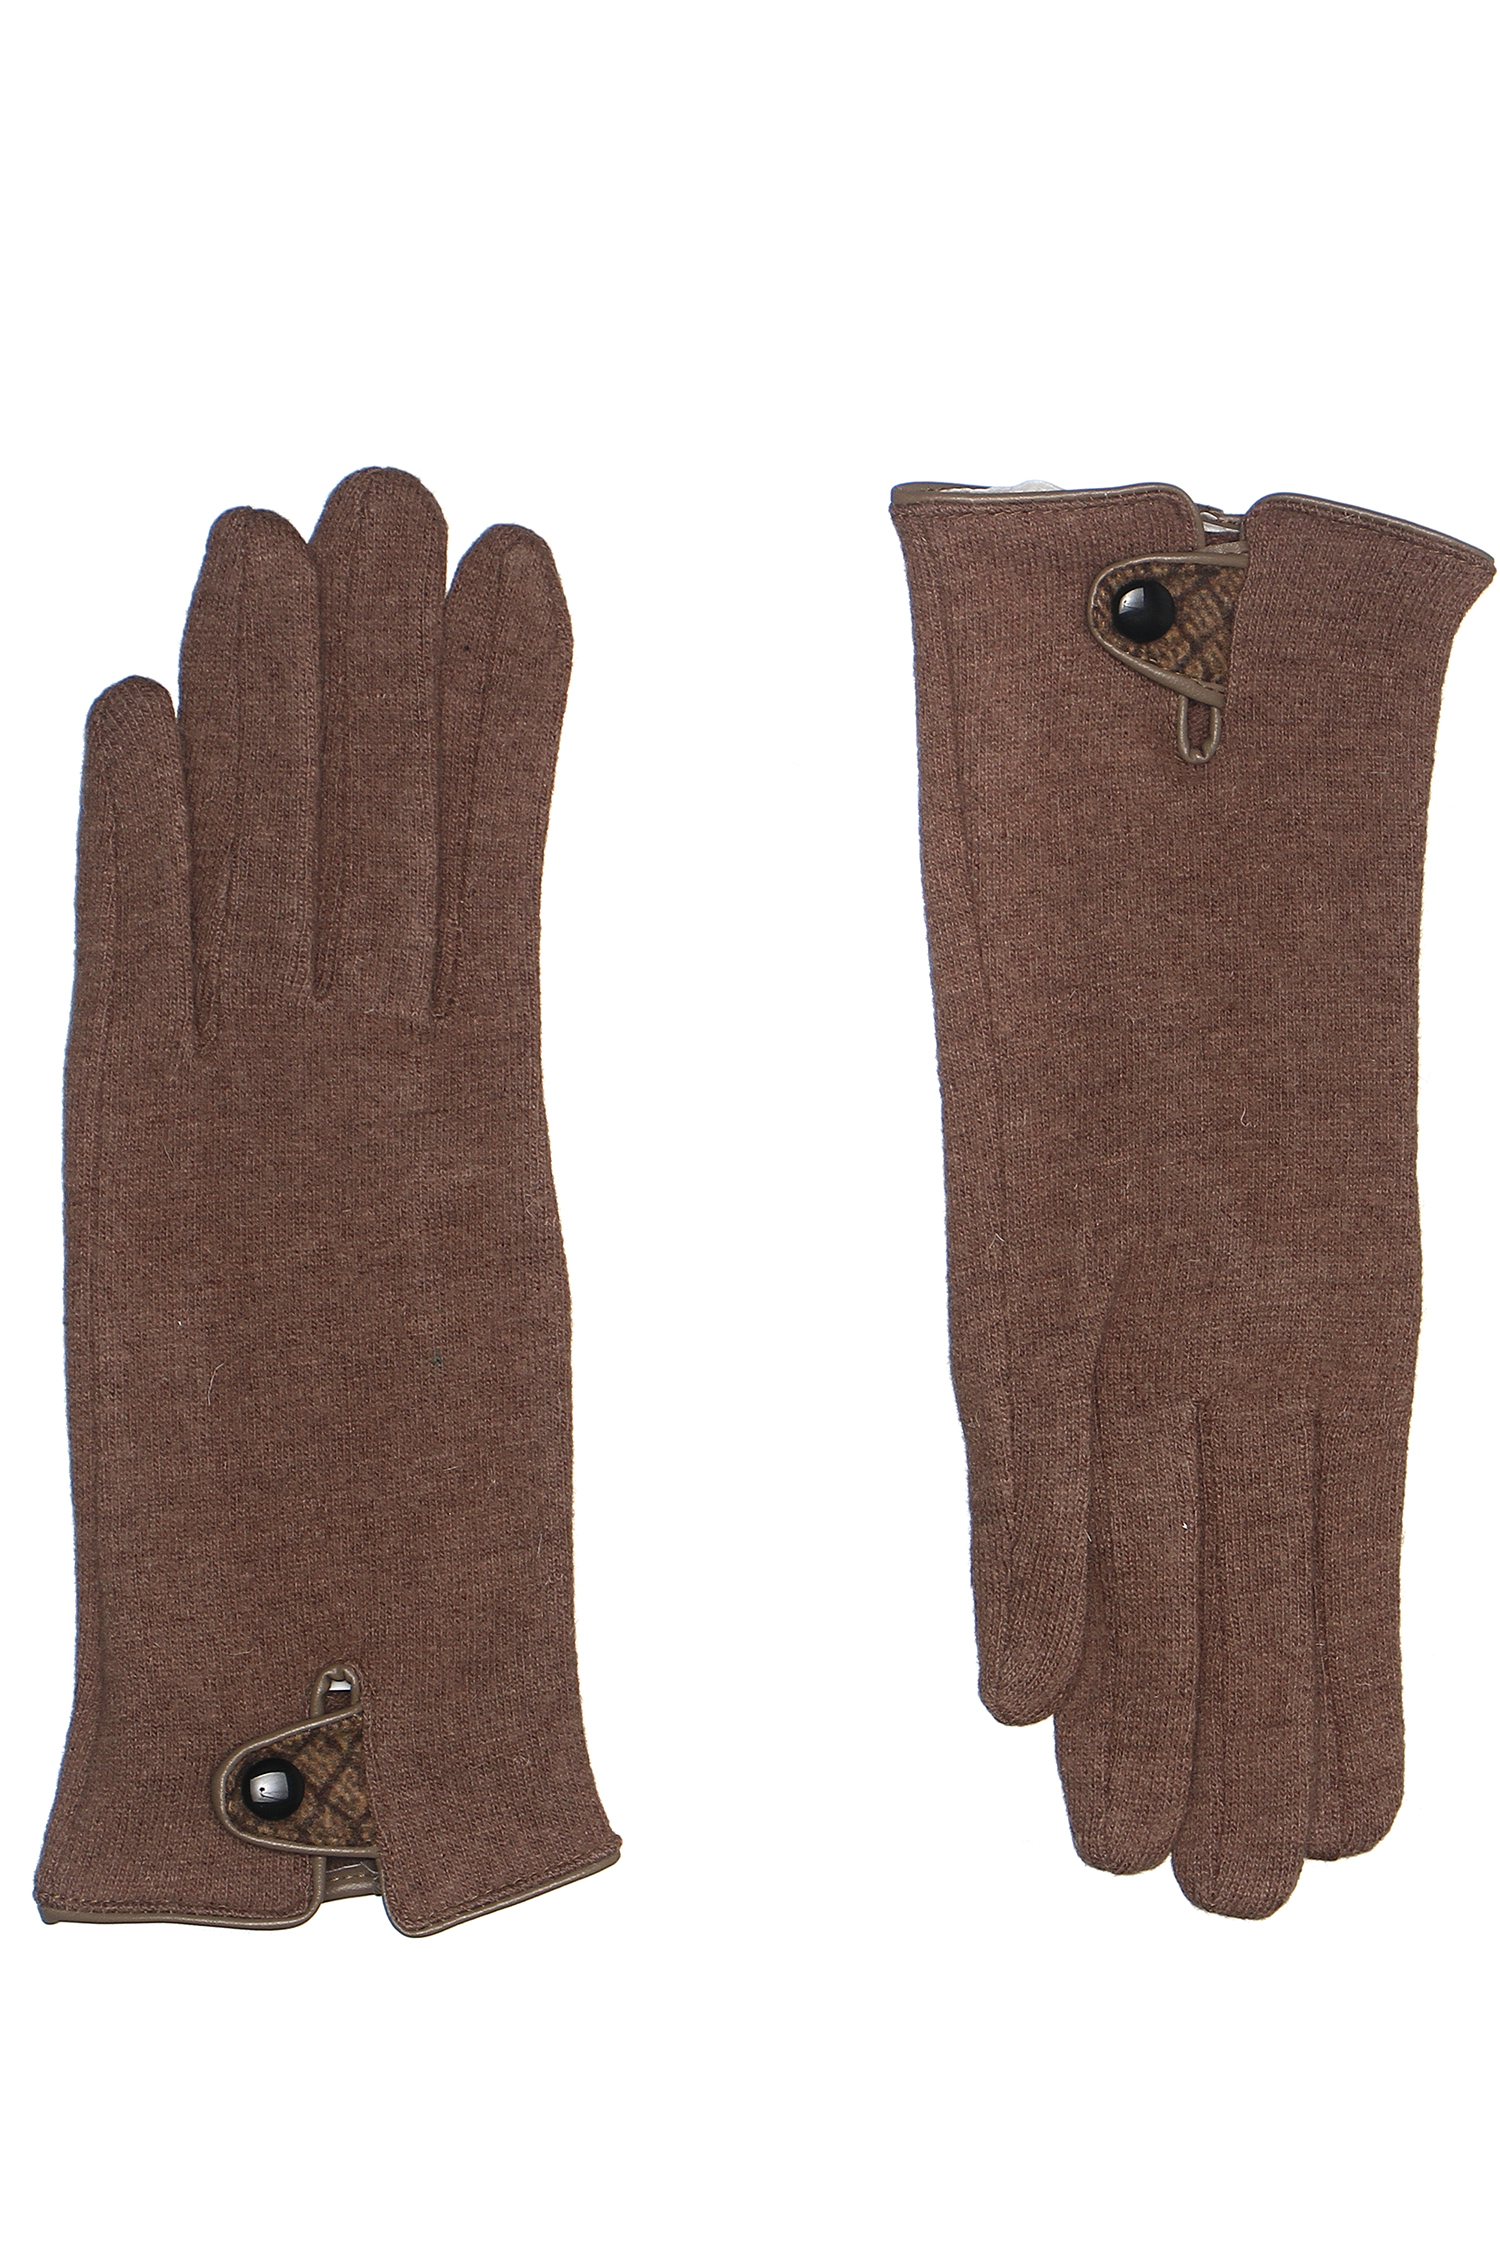 Перчатки женские из трикотажа